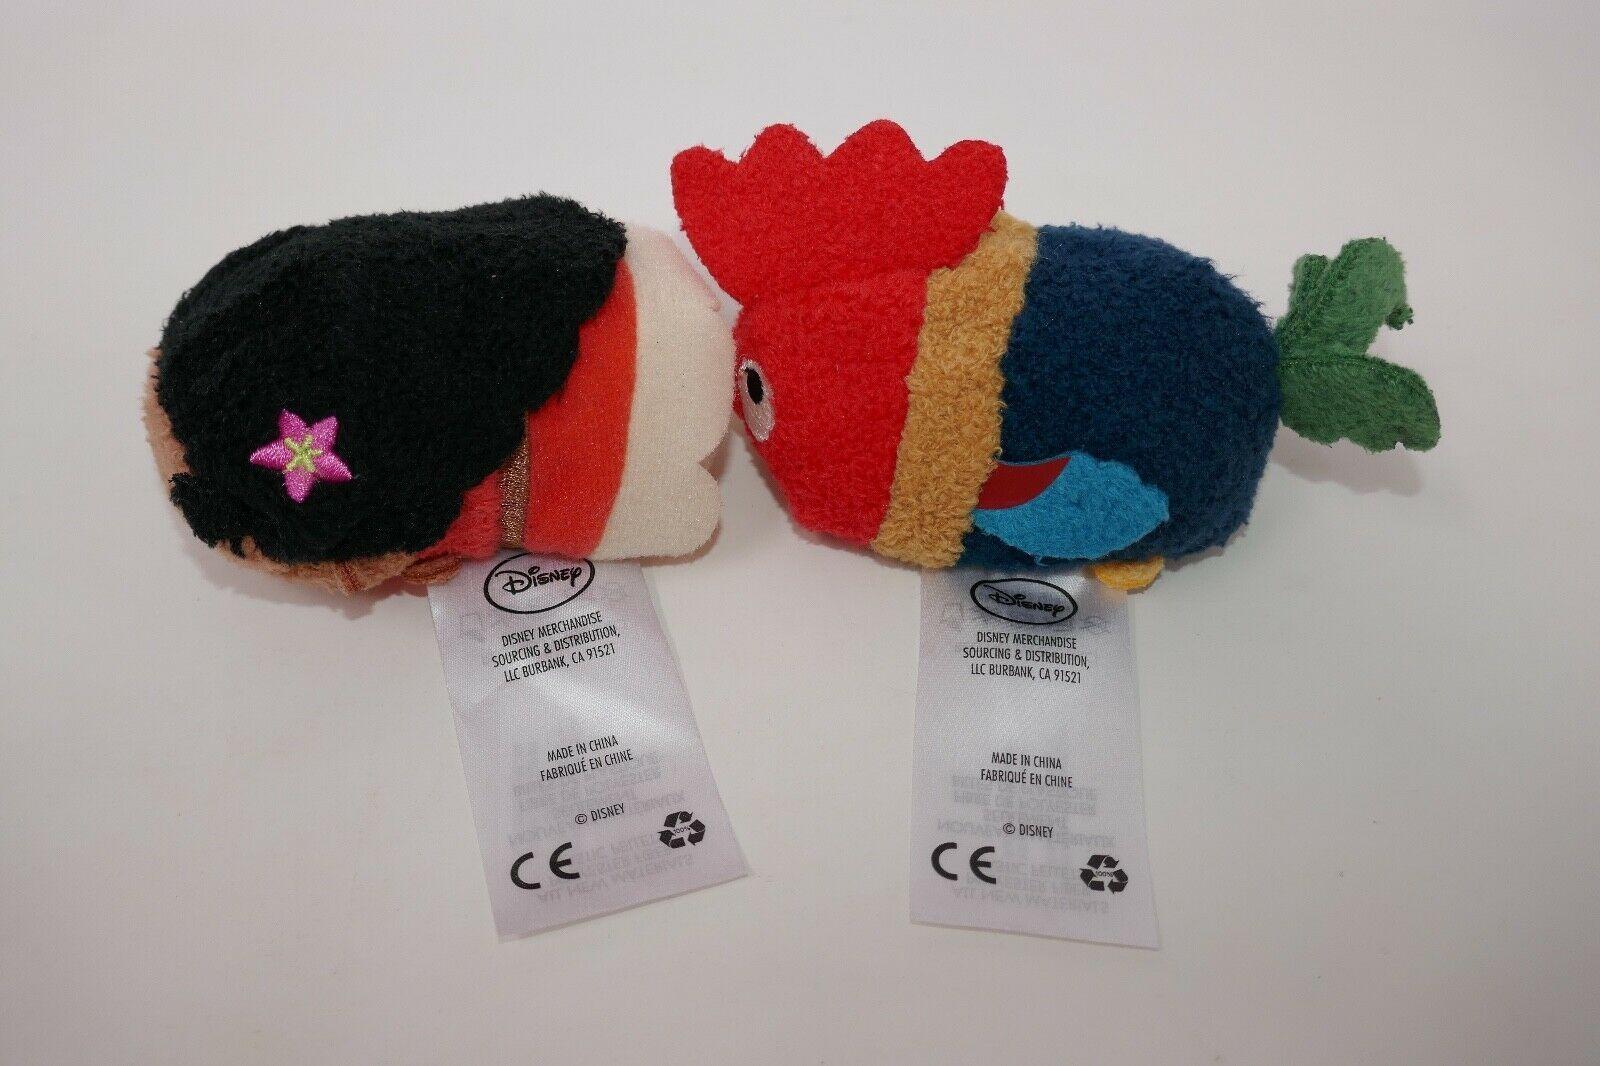 "Disney Store Tsum Tsum 3"" Plush Stuffed Animal - Moana HeiHei"